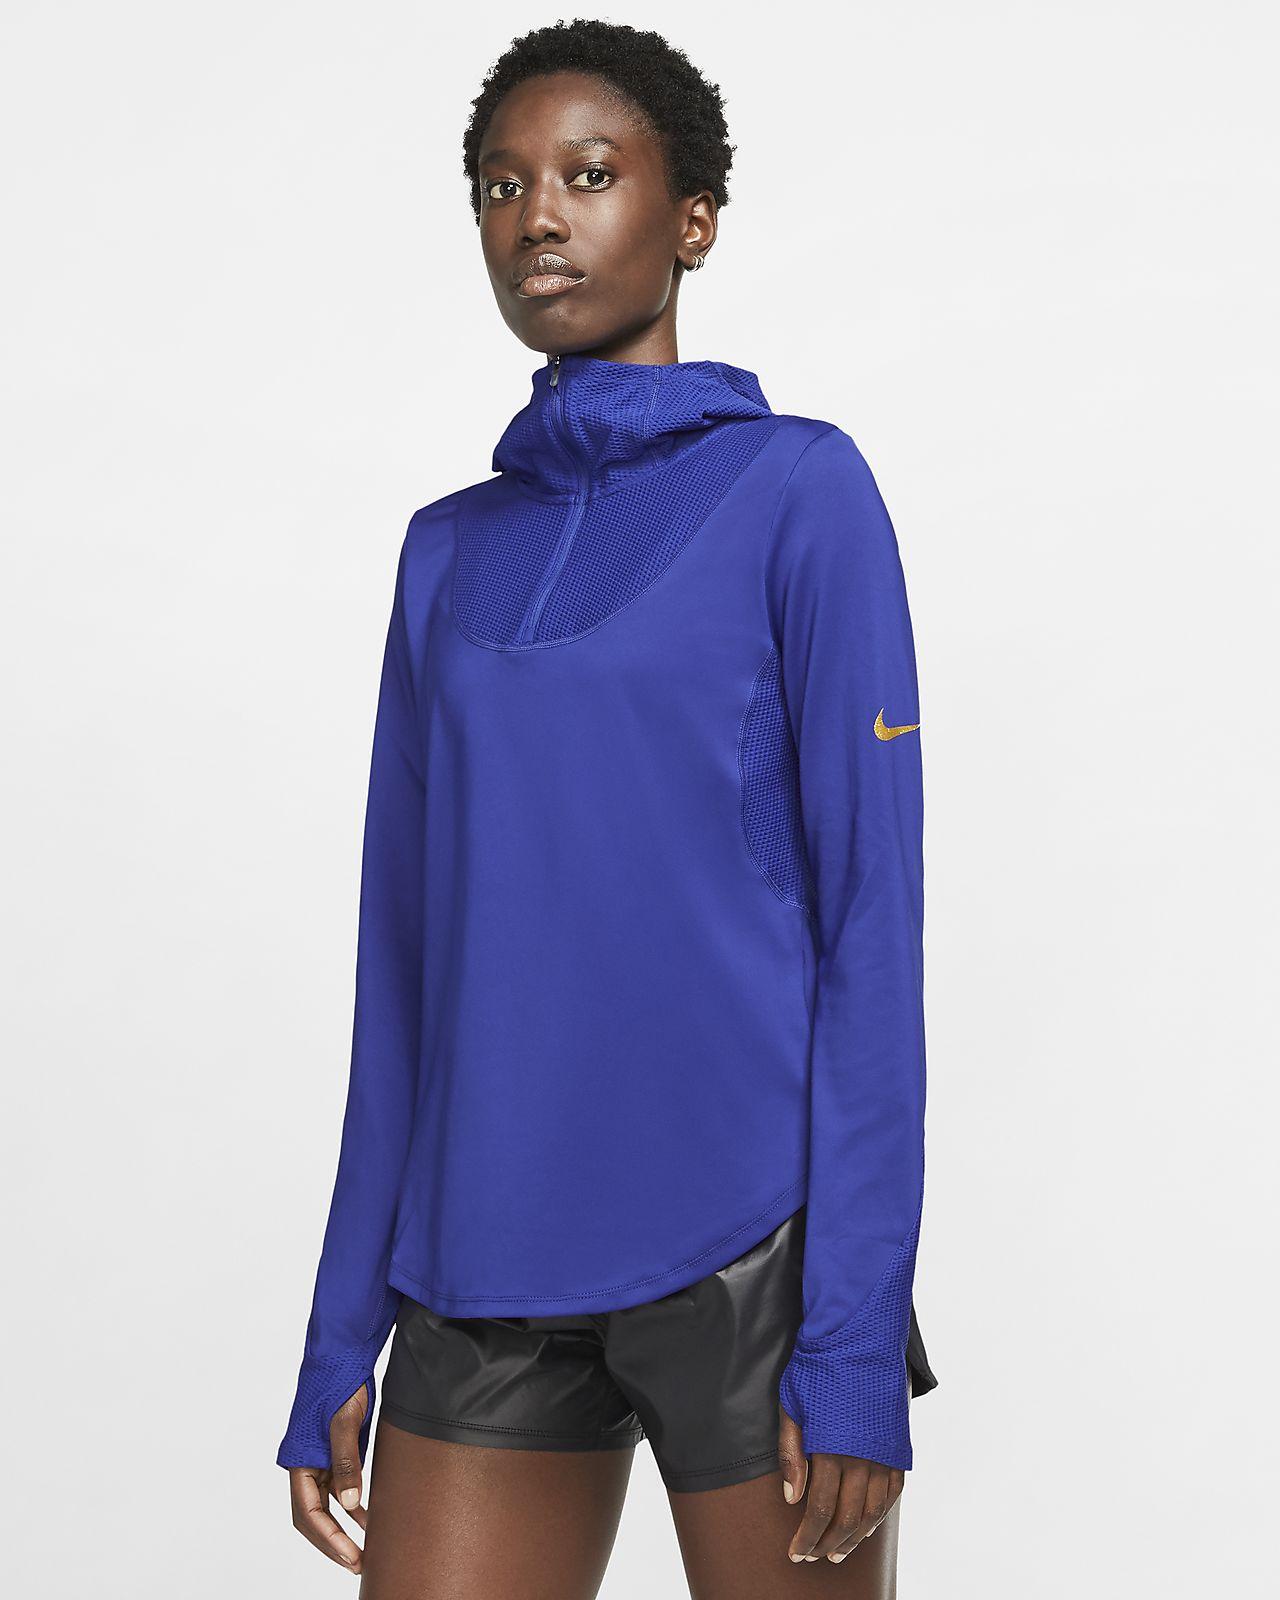 Prenda para la parte superior de running de manga larga para mujer Nike